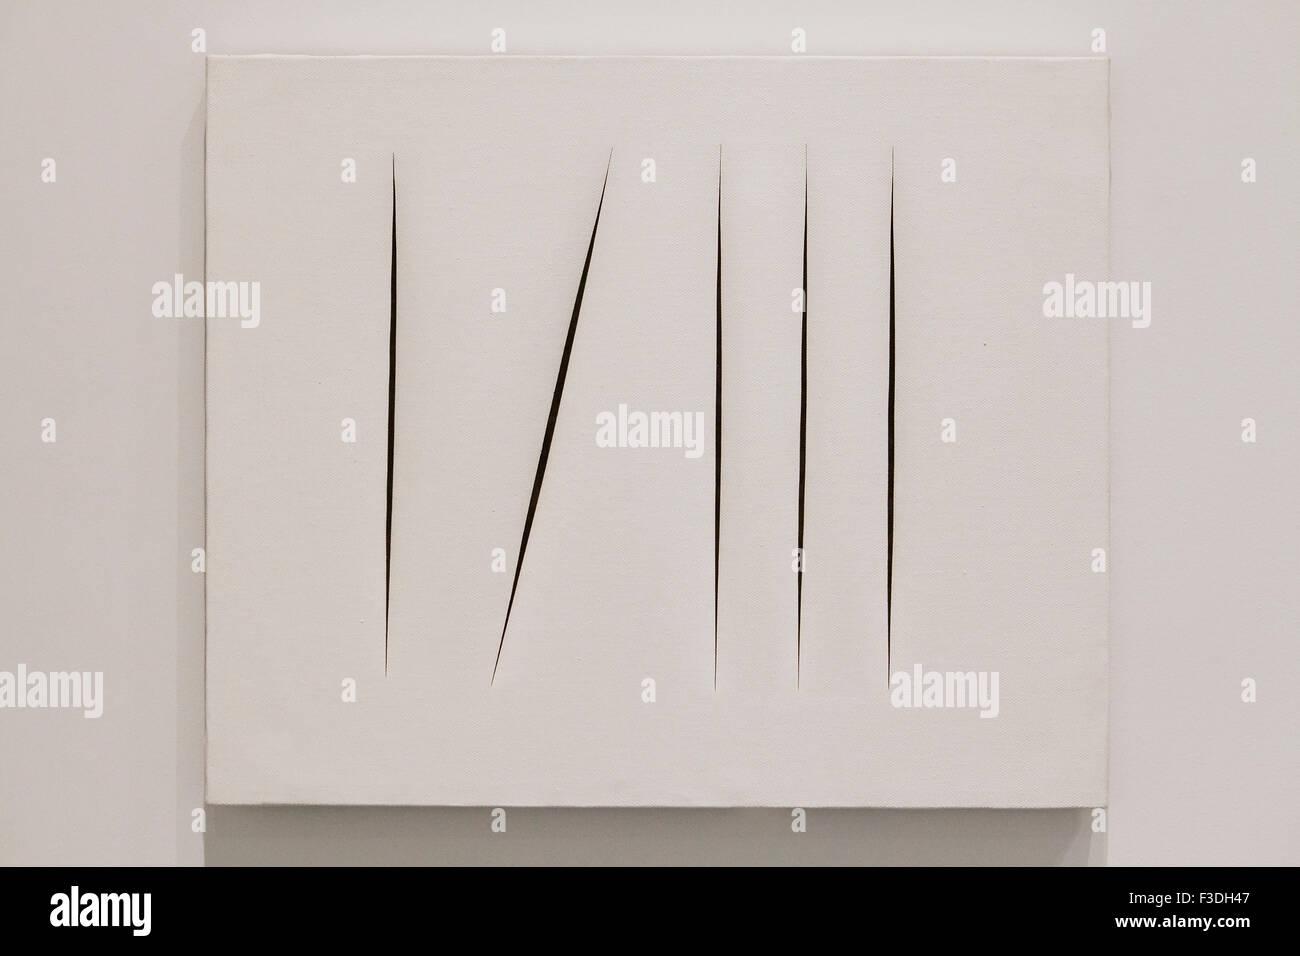 Spacial Concept Expectations by Lucio Fontana, 1967 - Stock Image